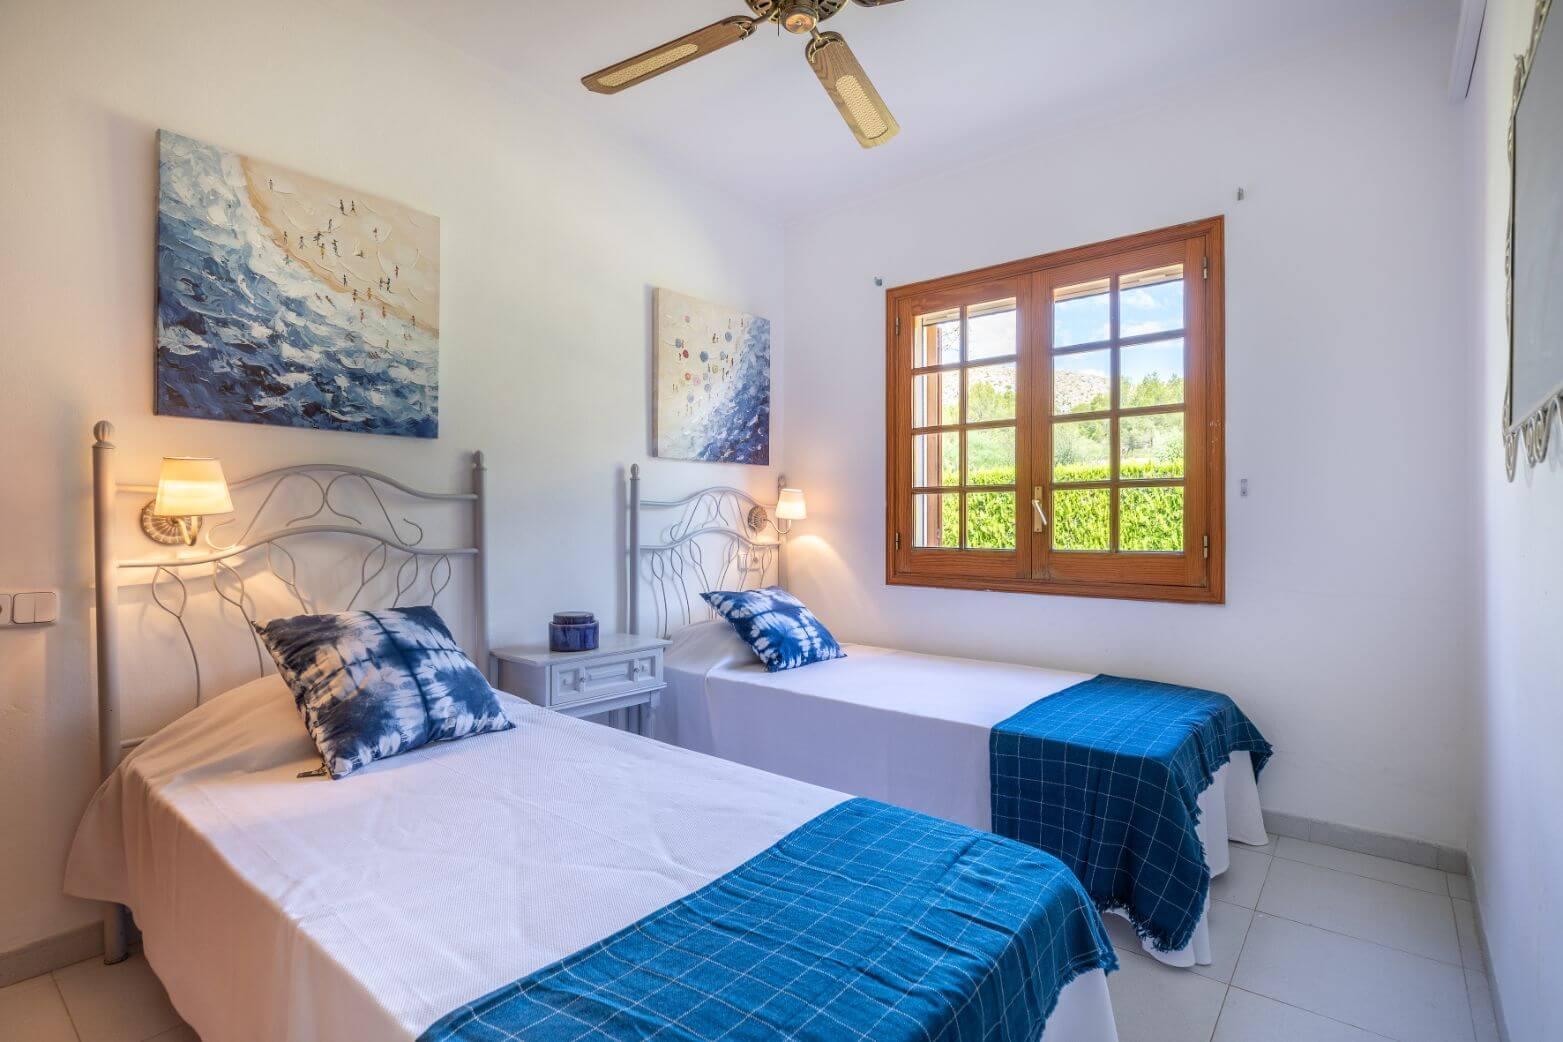 5 bedroom villa rental puerto pollensa